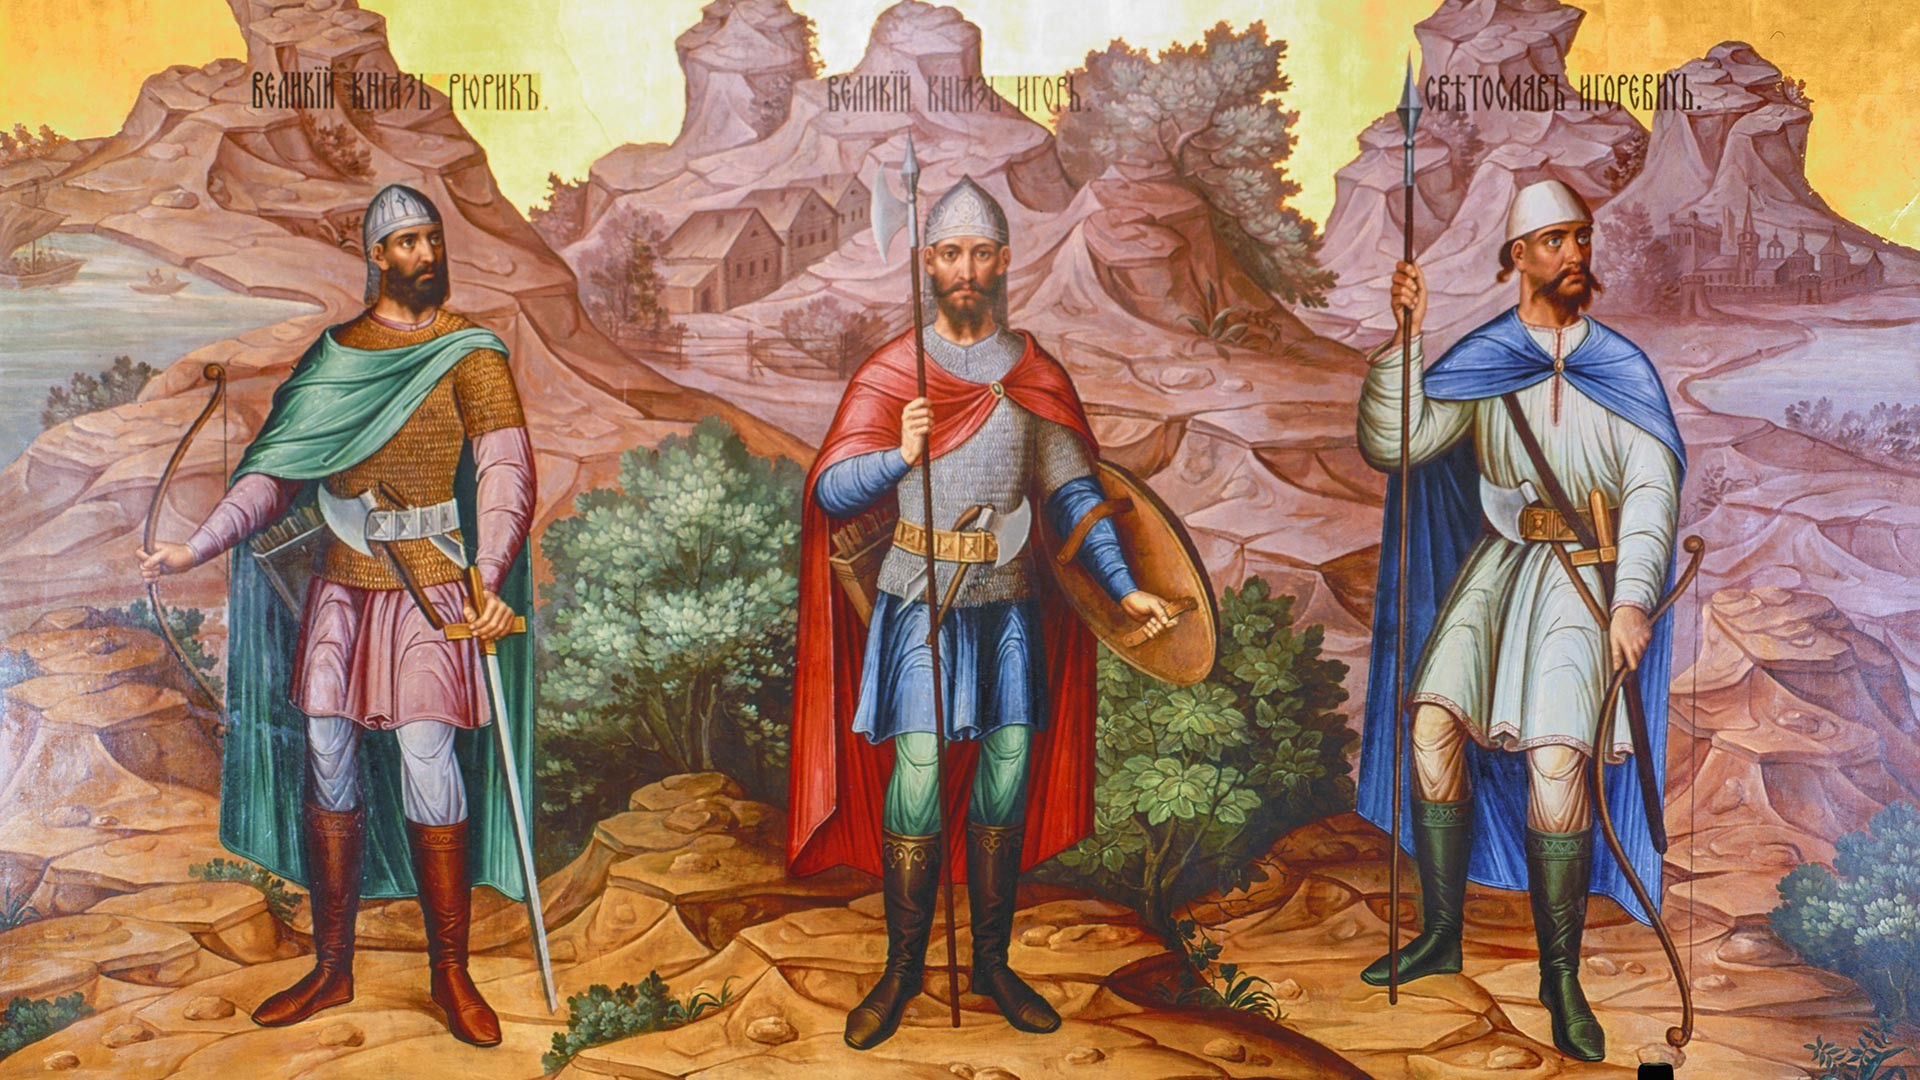 Велики кнез Рјурик, Велики кнез Игор и Игор Свјатославович, Кремљ